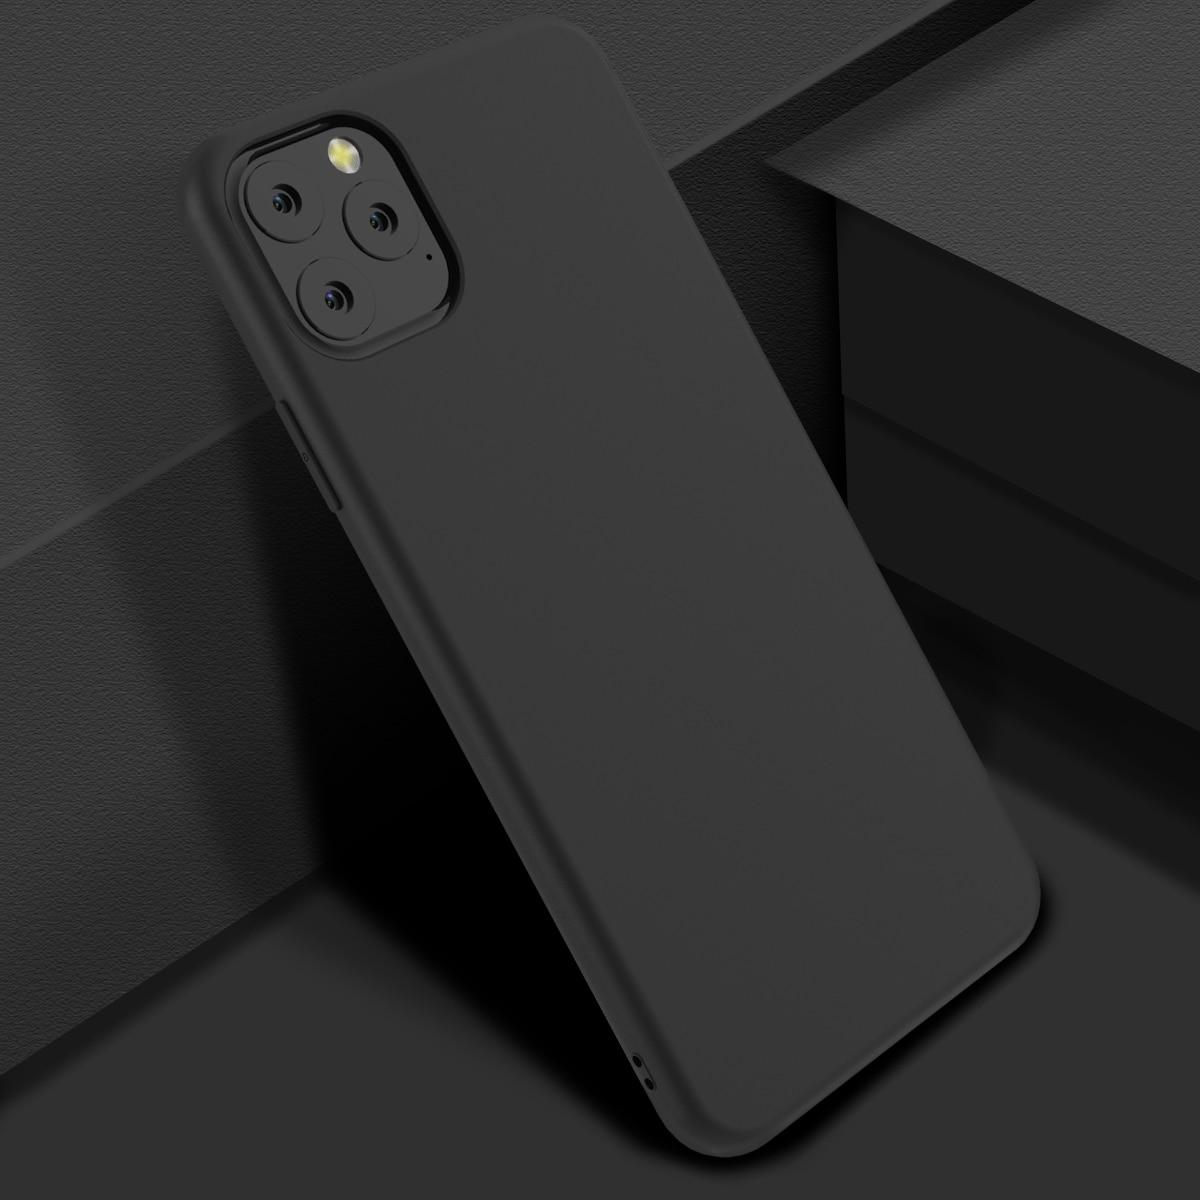 Torubia Silicone Case for iPhone 11/11 Pro/11 Pro Max 41